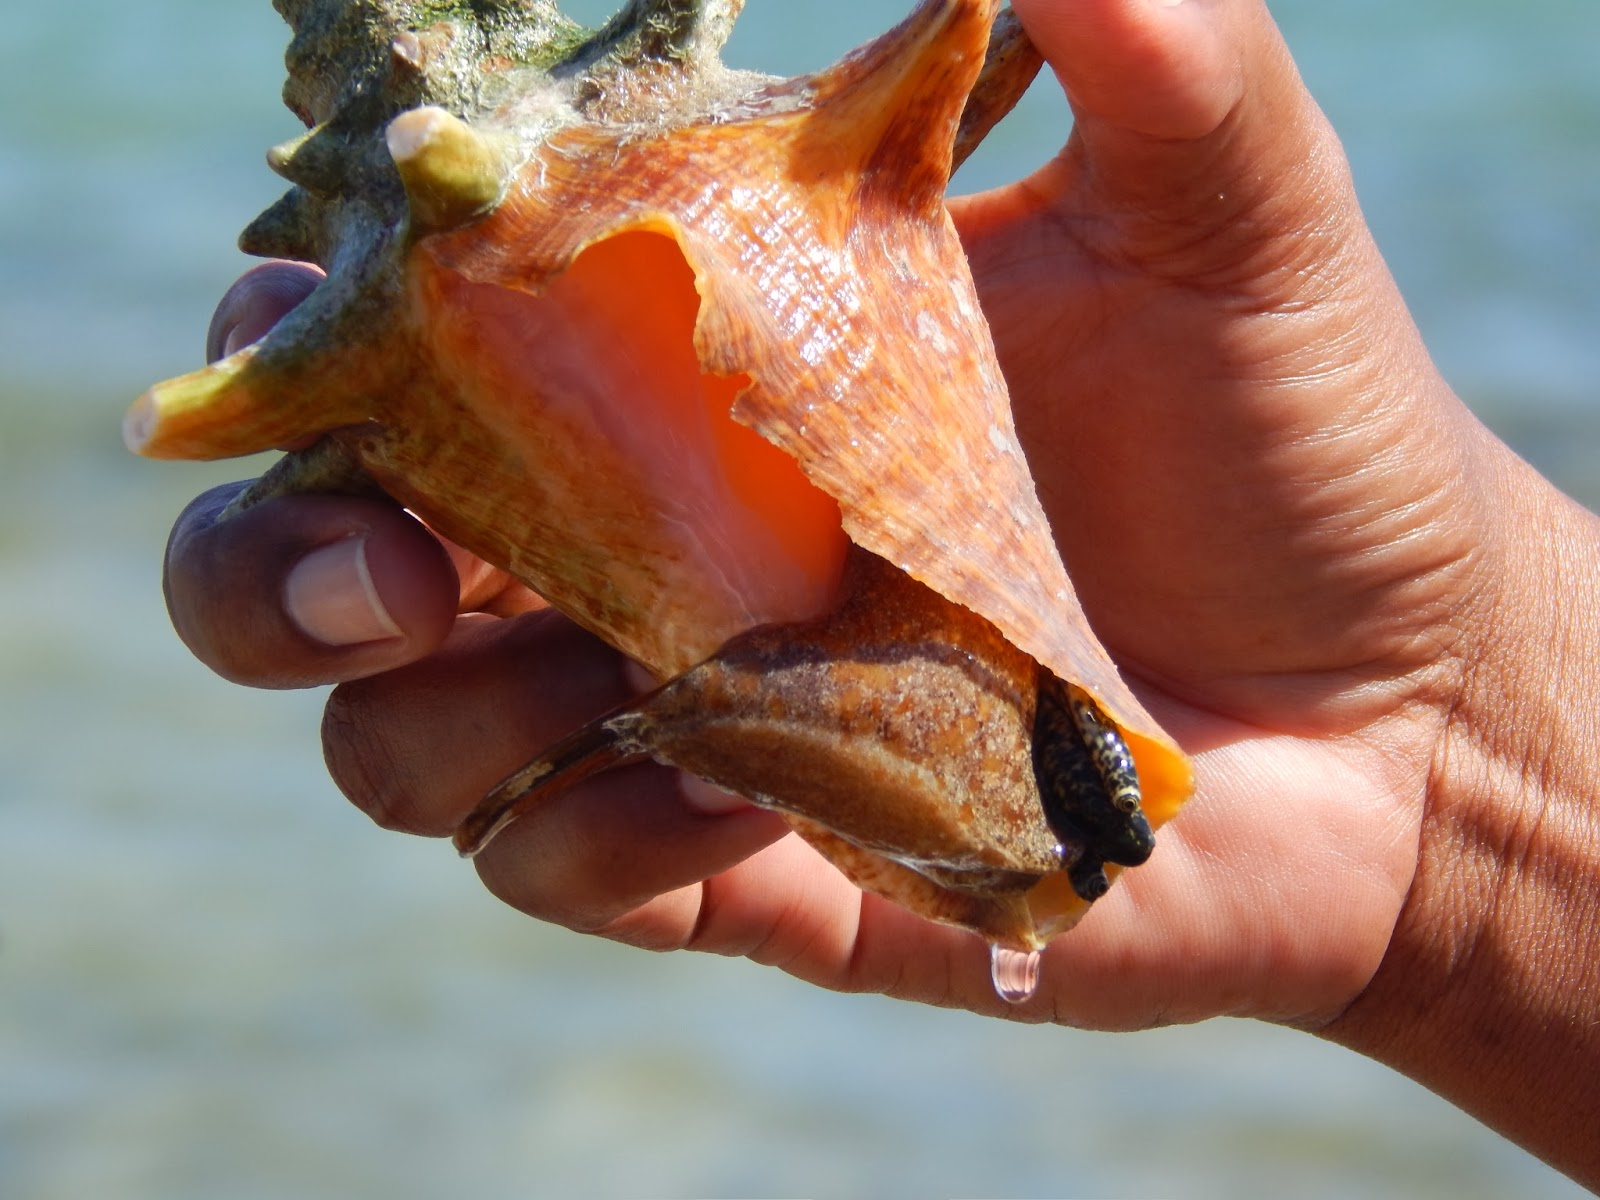 Lord flies conch shell symbolism essay